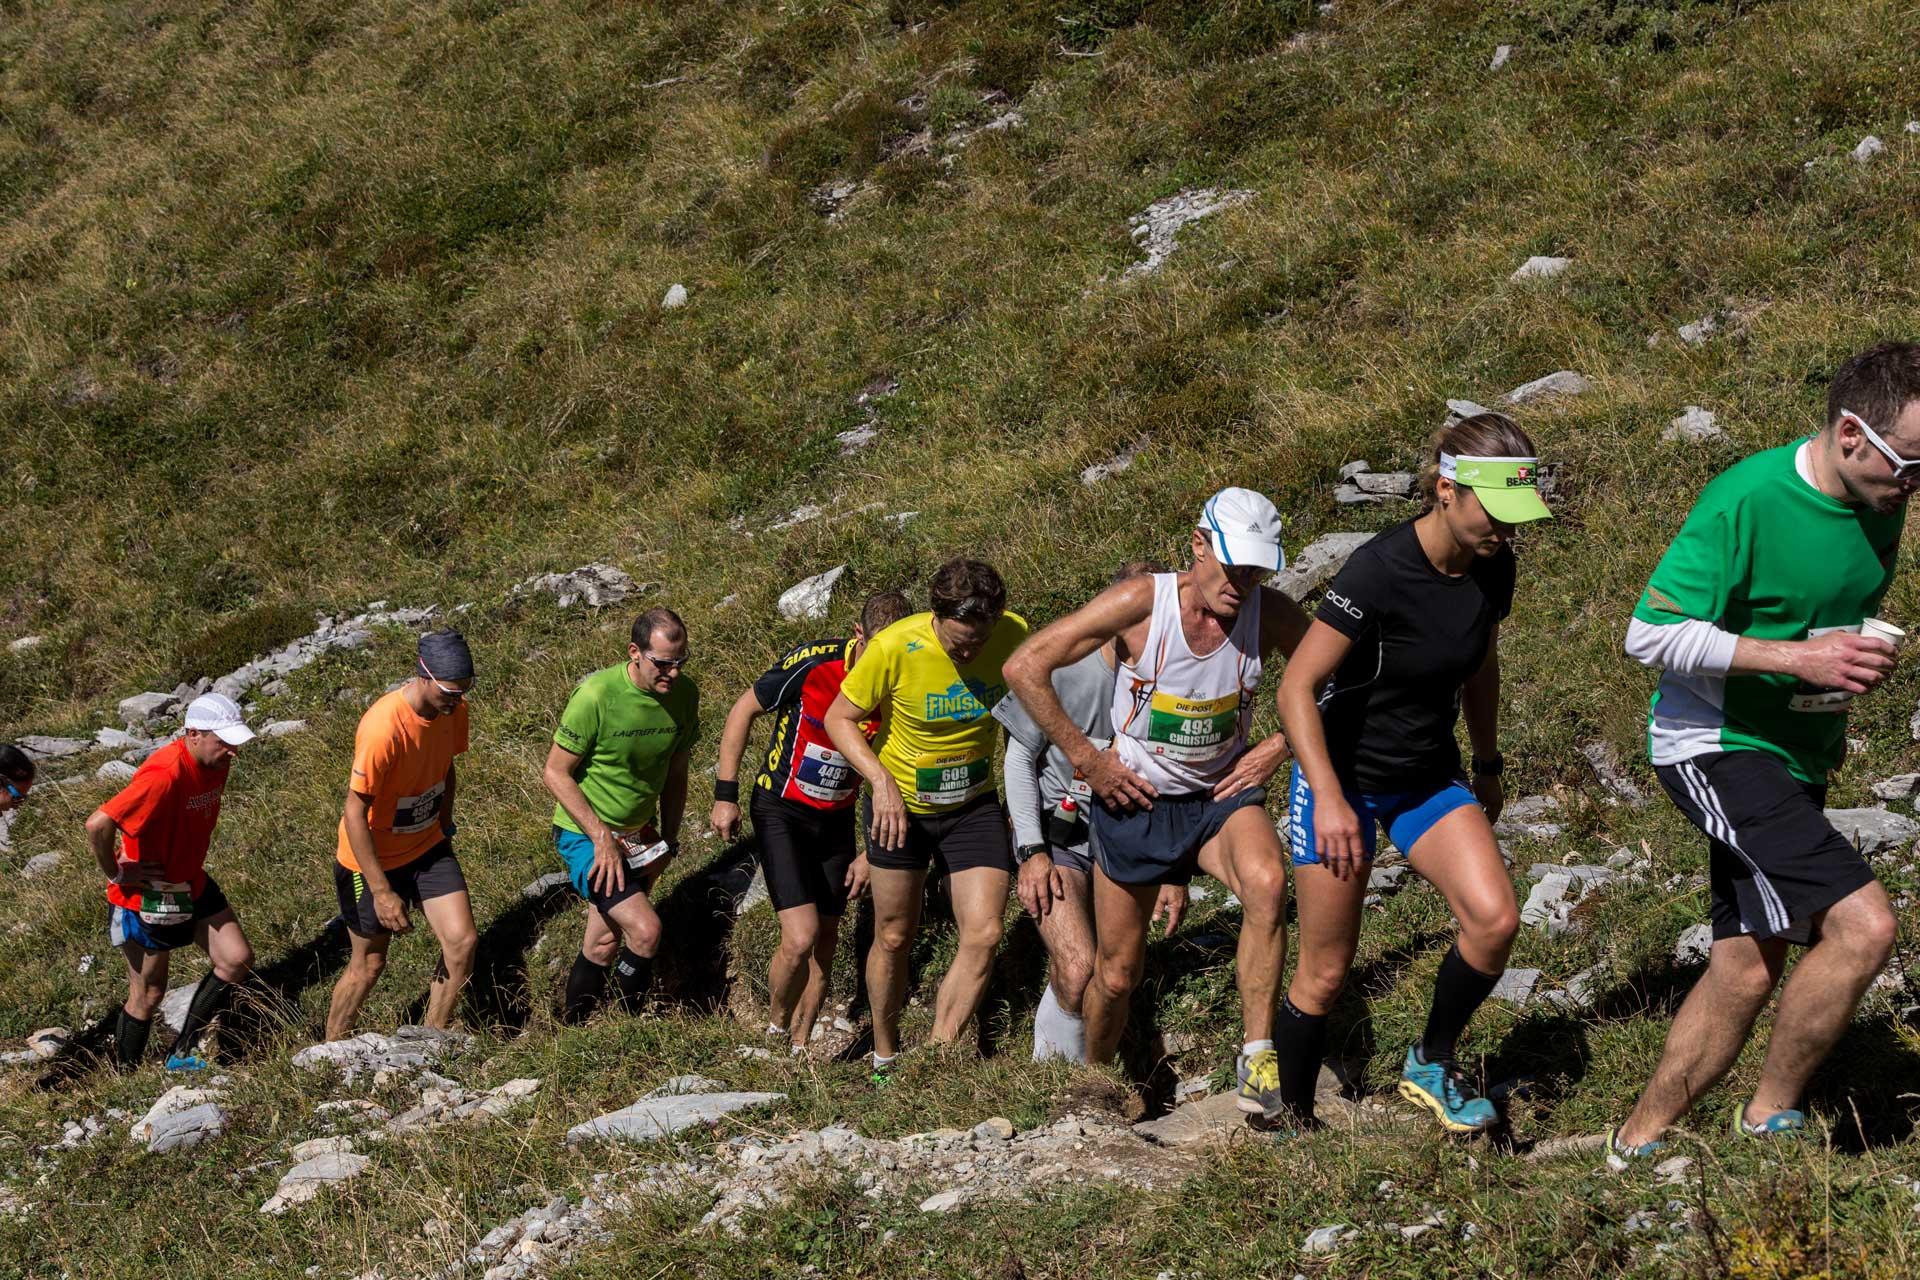 Jungfrau-Marathon-12